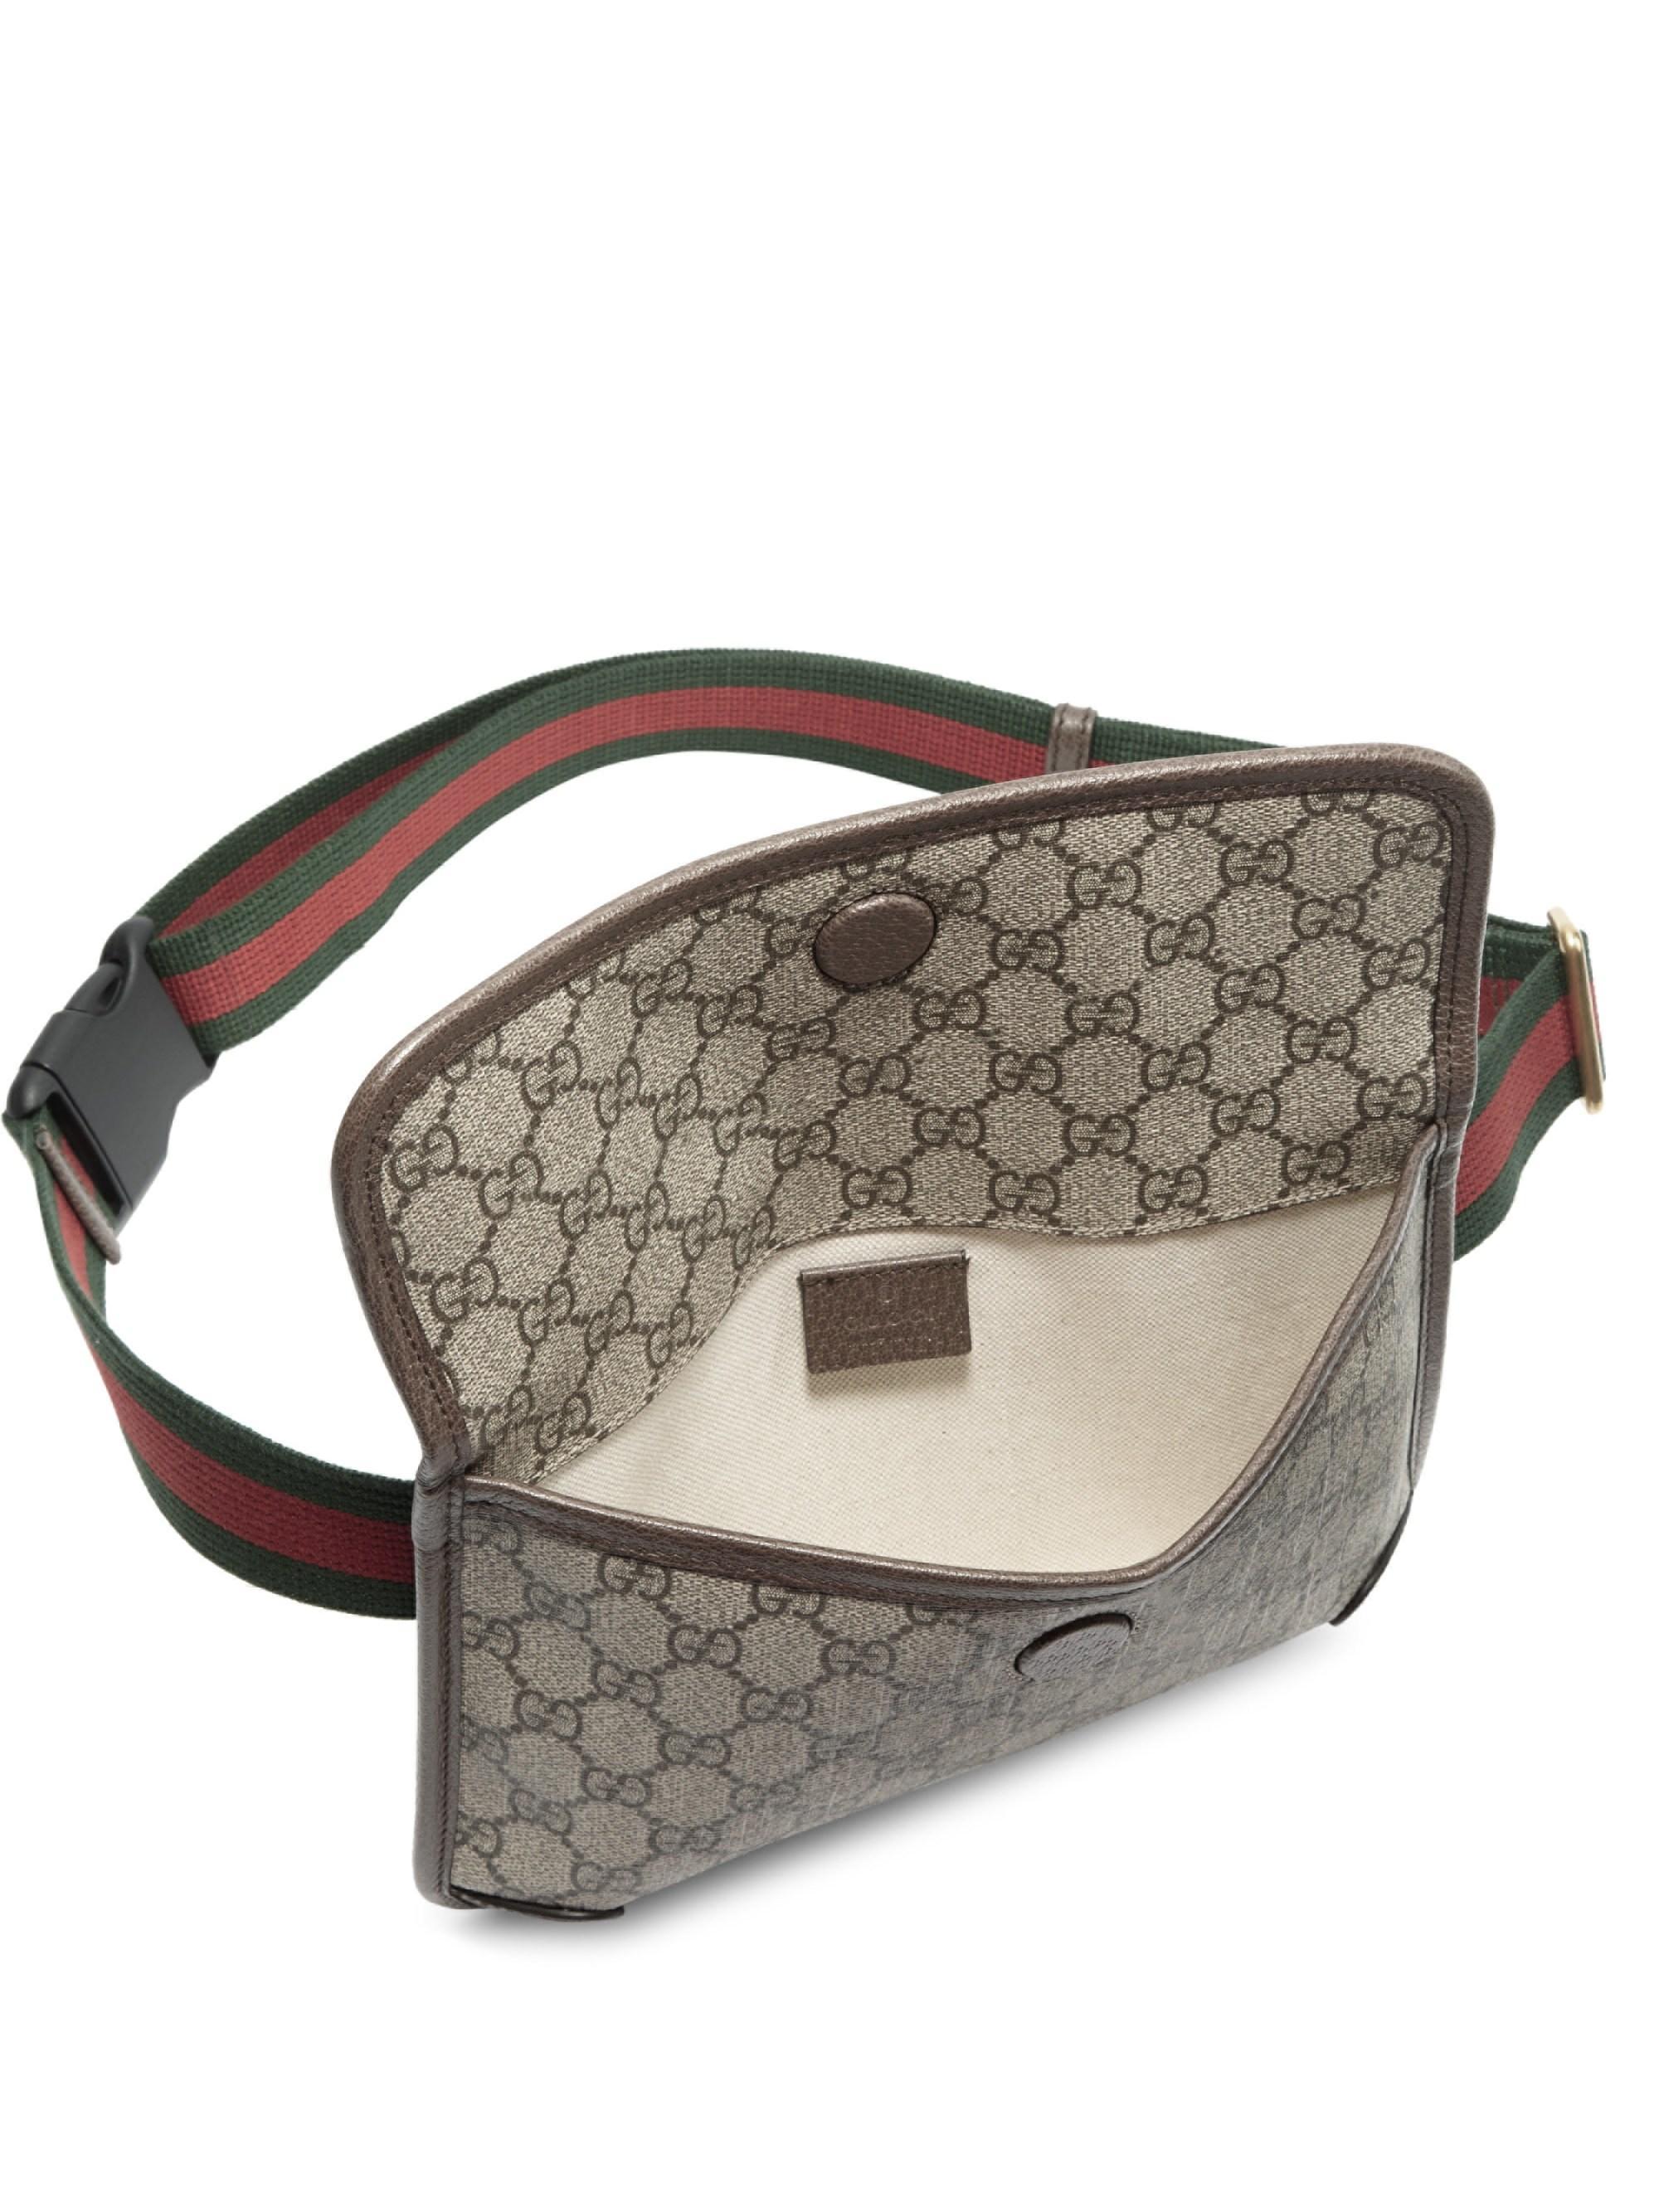 6edb4c0ac73 Lyst Gucci Women S Neo Vintage Canvas Belt Bag Beige In Natural